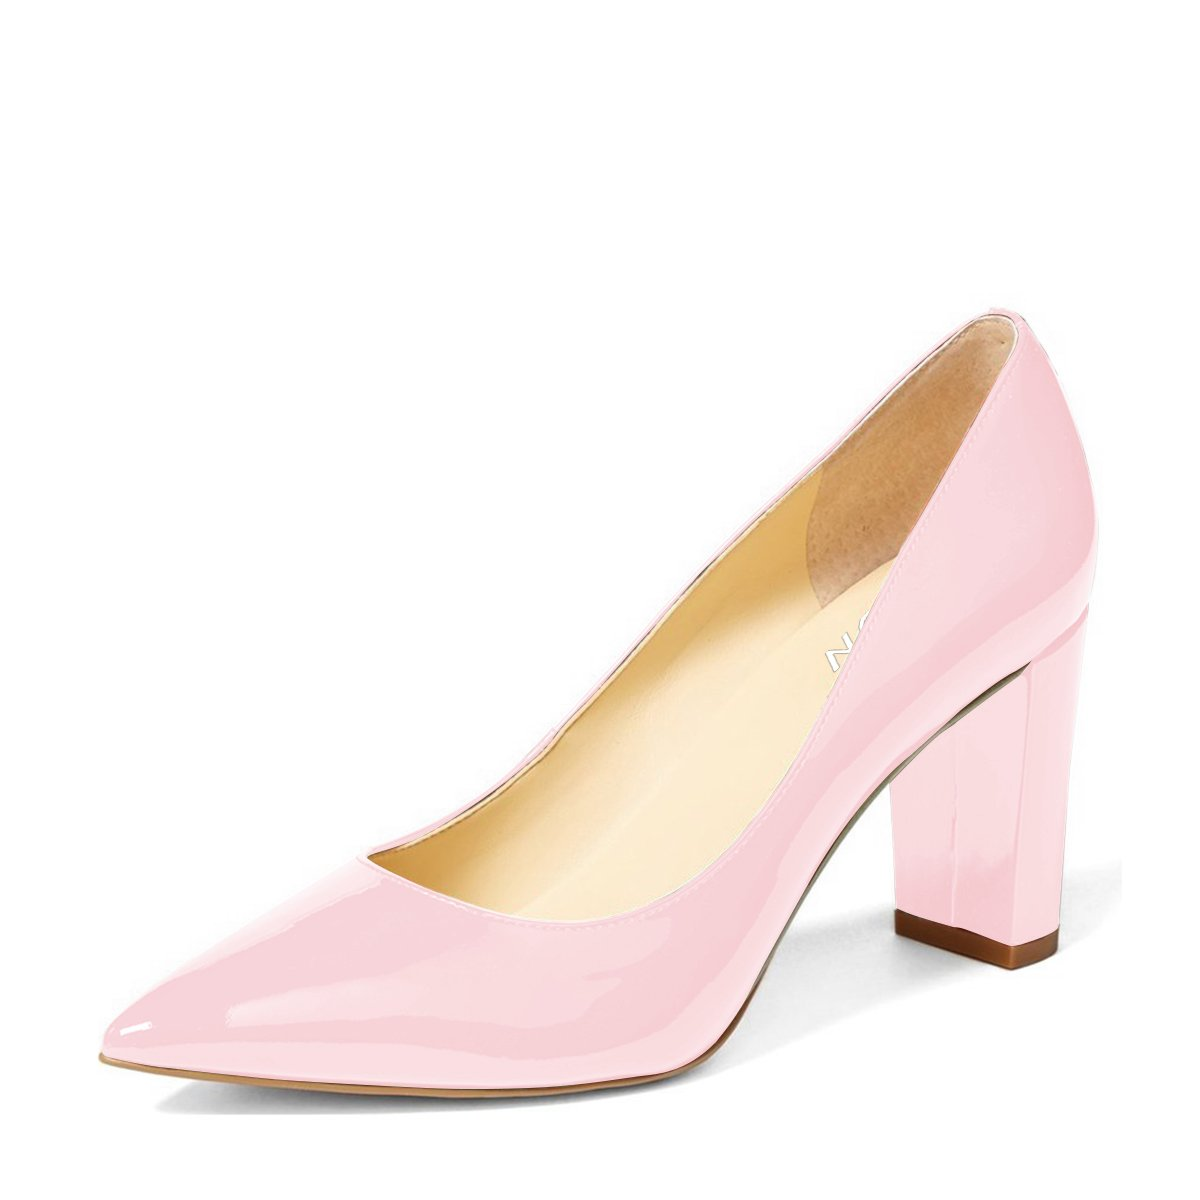 YDN Women's Classic Pointy Toe OL Pumps Slip-On Patent Leather Block Heel Dress Shoes B01MRP6Q9G 8.5 B(M) US|Pink